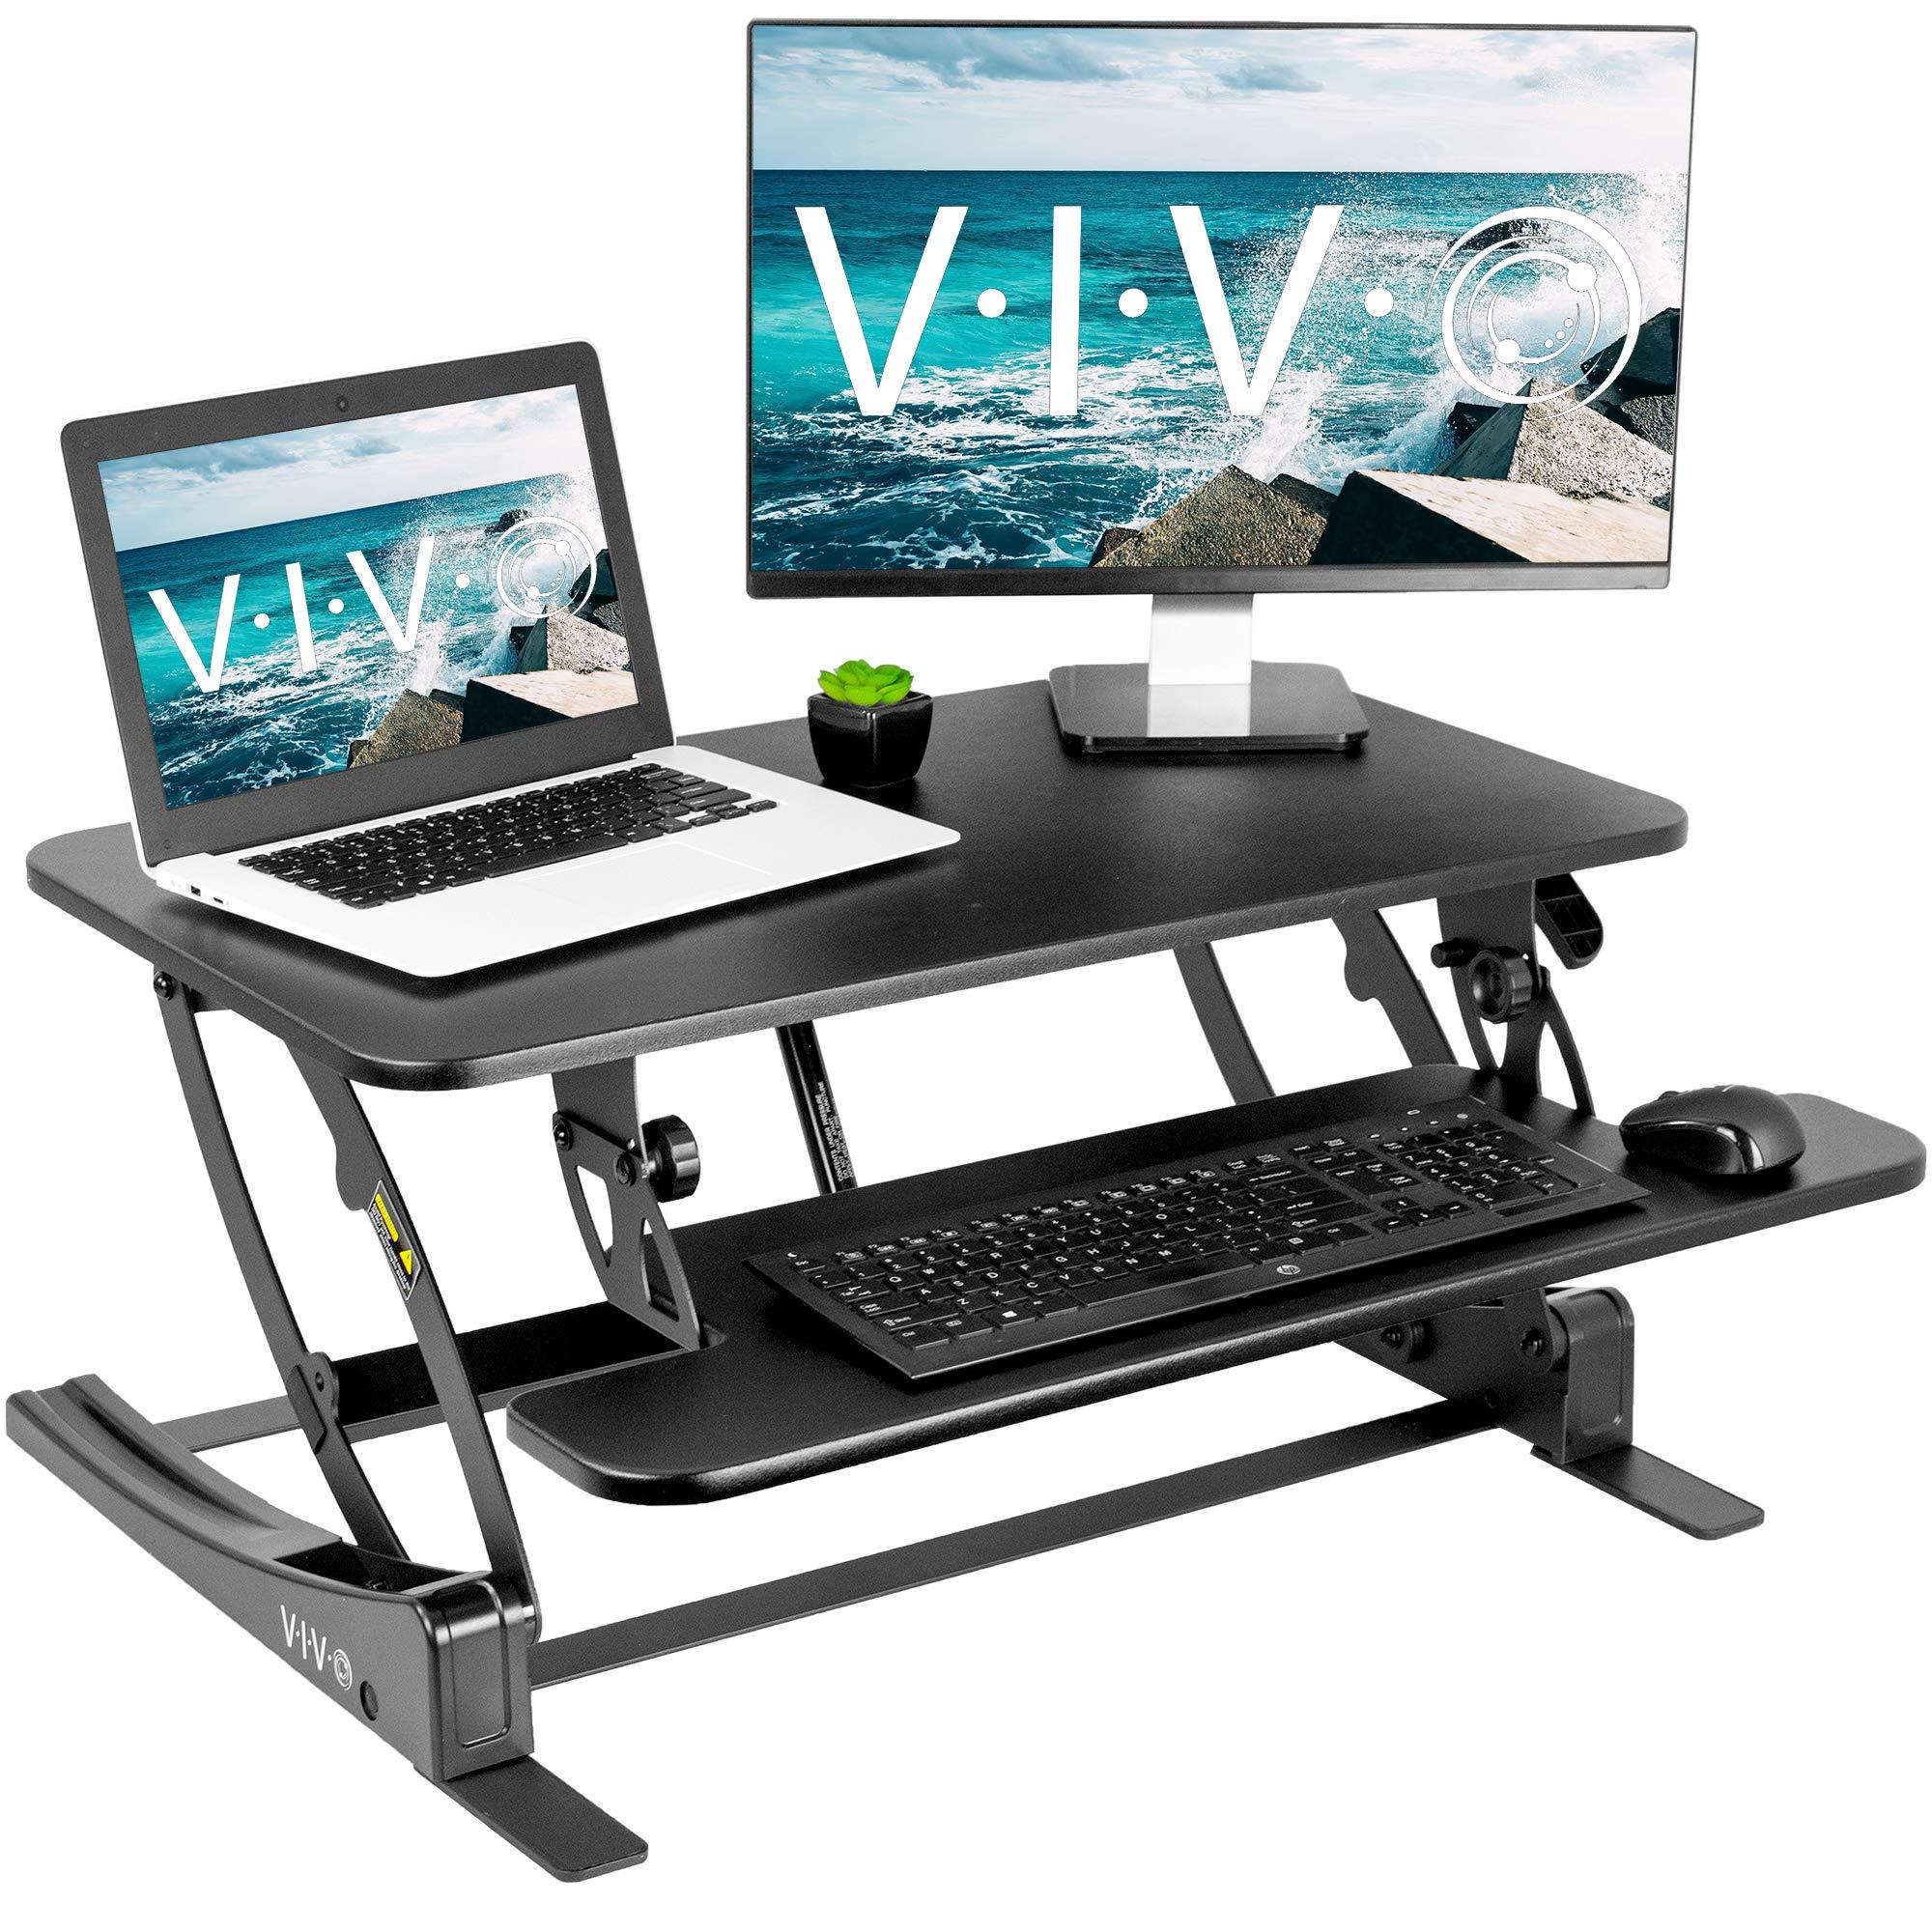 VIVO Black Height Adjustable 32 inch Stand Up Desk Converter   Quick Sit to Stand Tabletop Dual Monitor Riser Workstation (DESK-V000VS) by VIVO